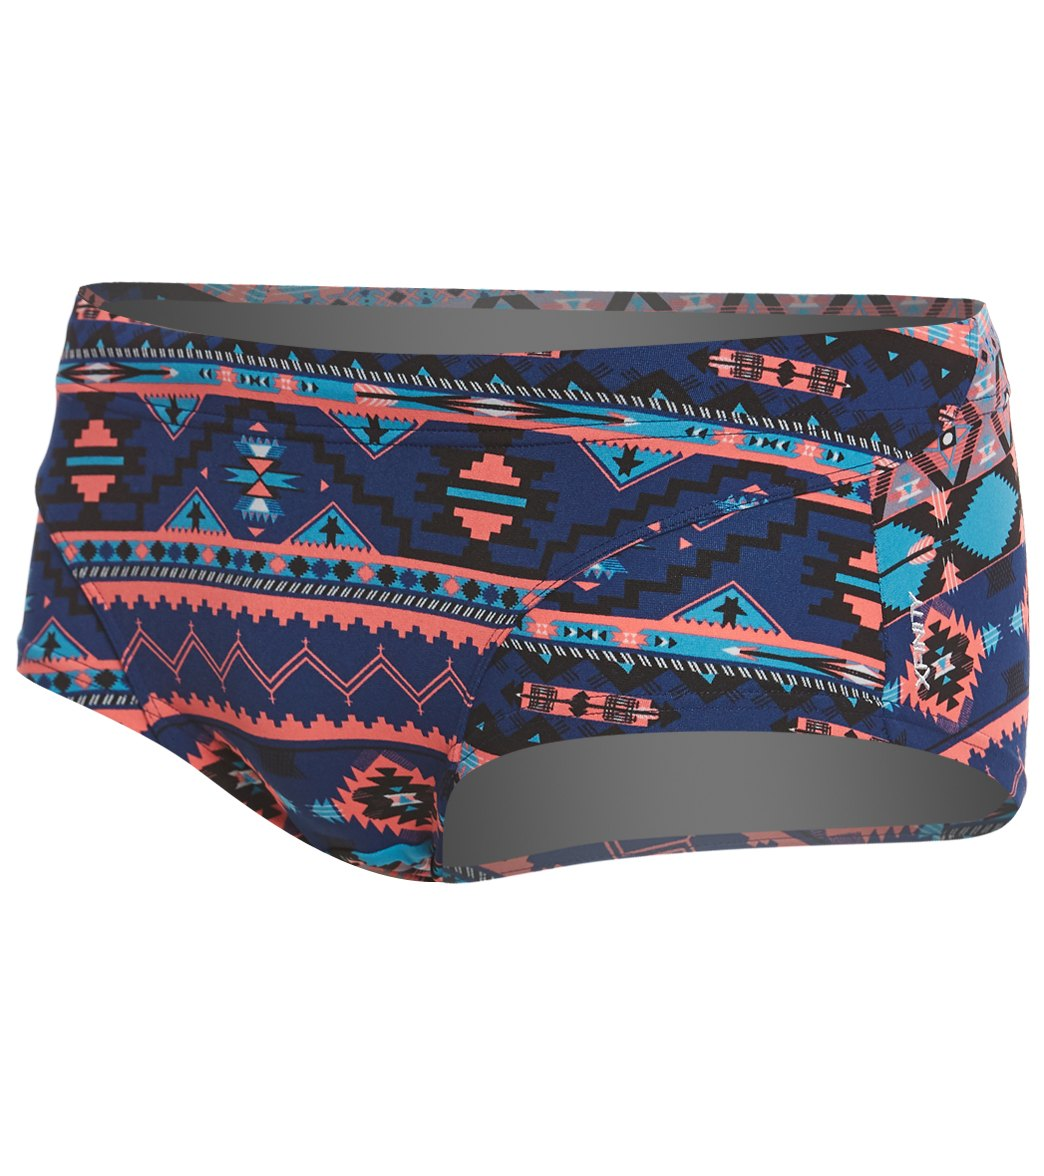 Zone 3 Men s Aztec Brief Shorts at SwimOutlet.com 0bf09b5244dc